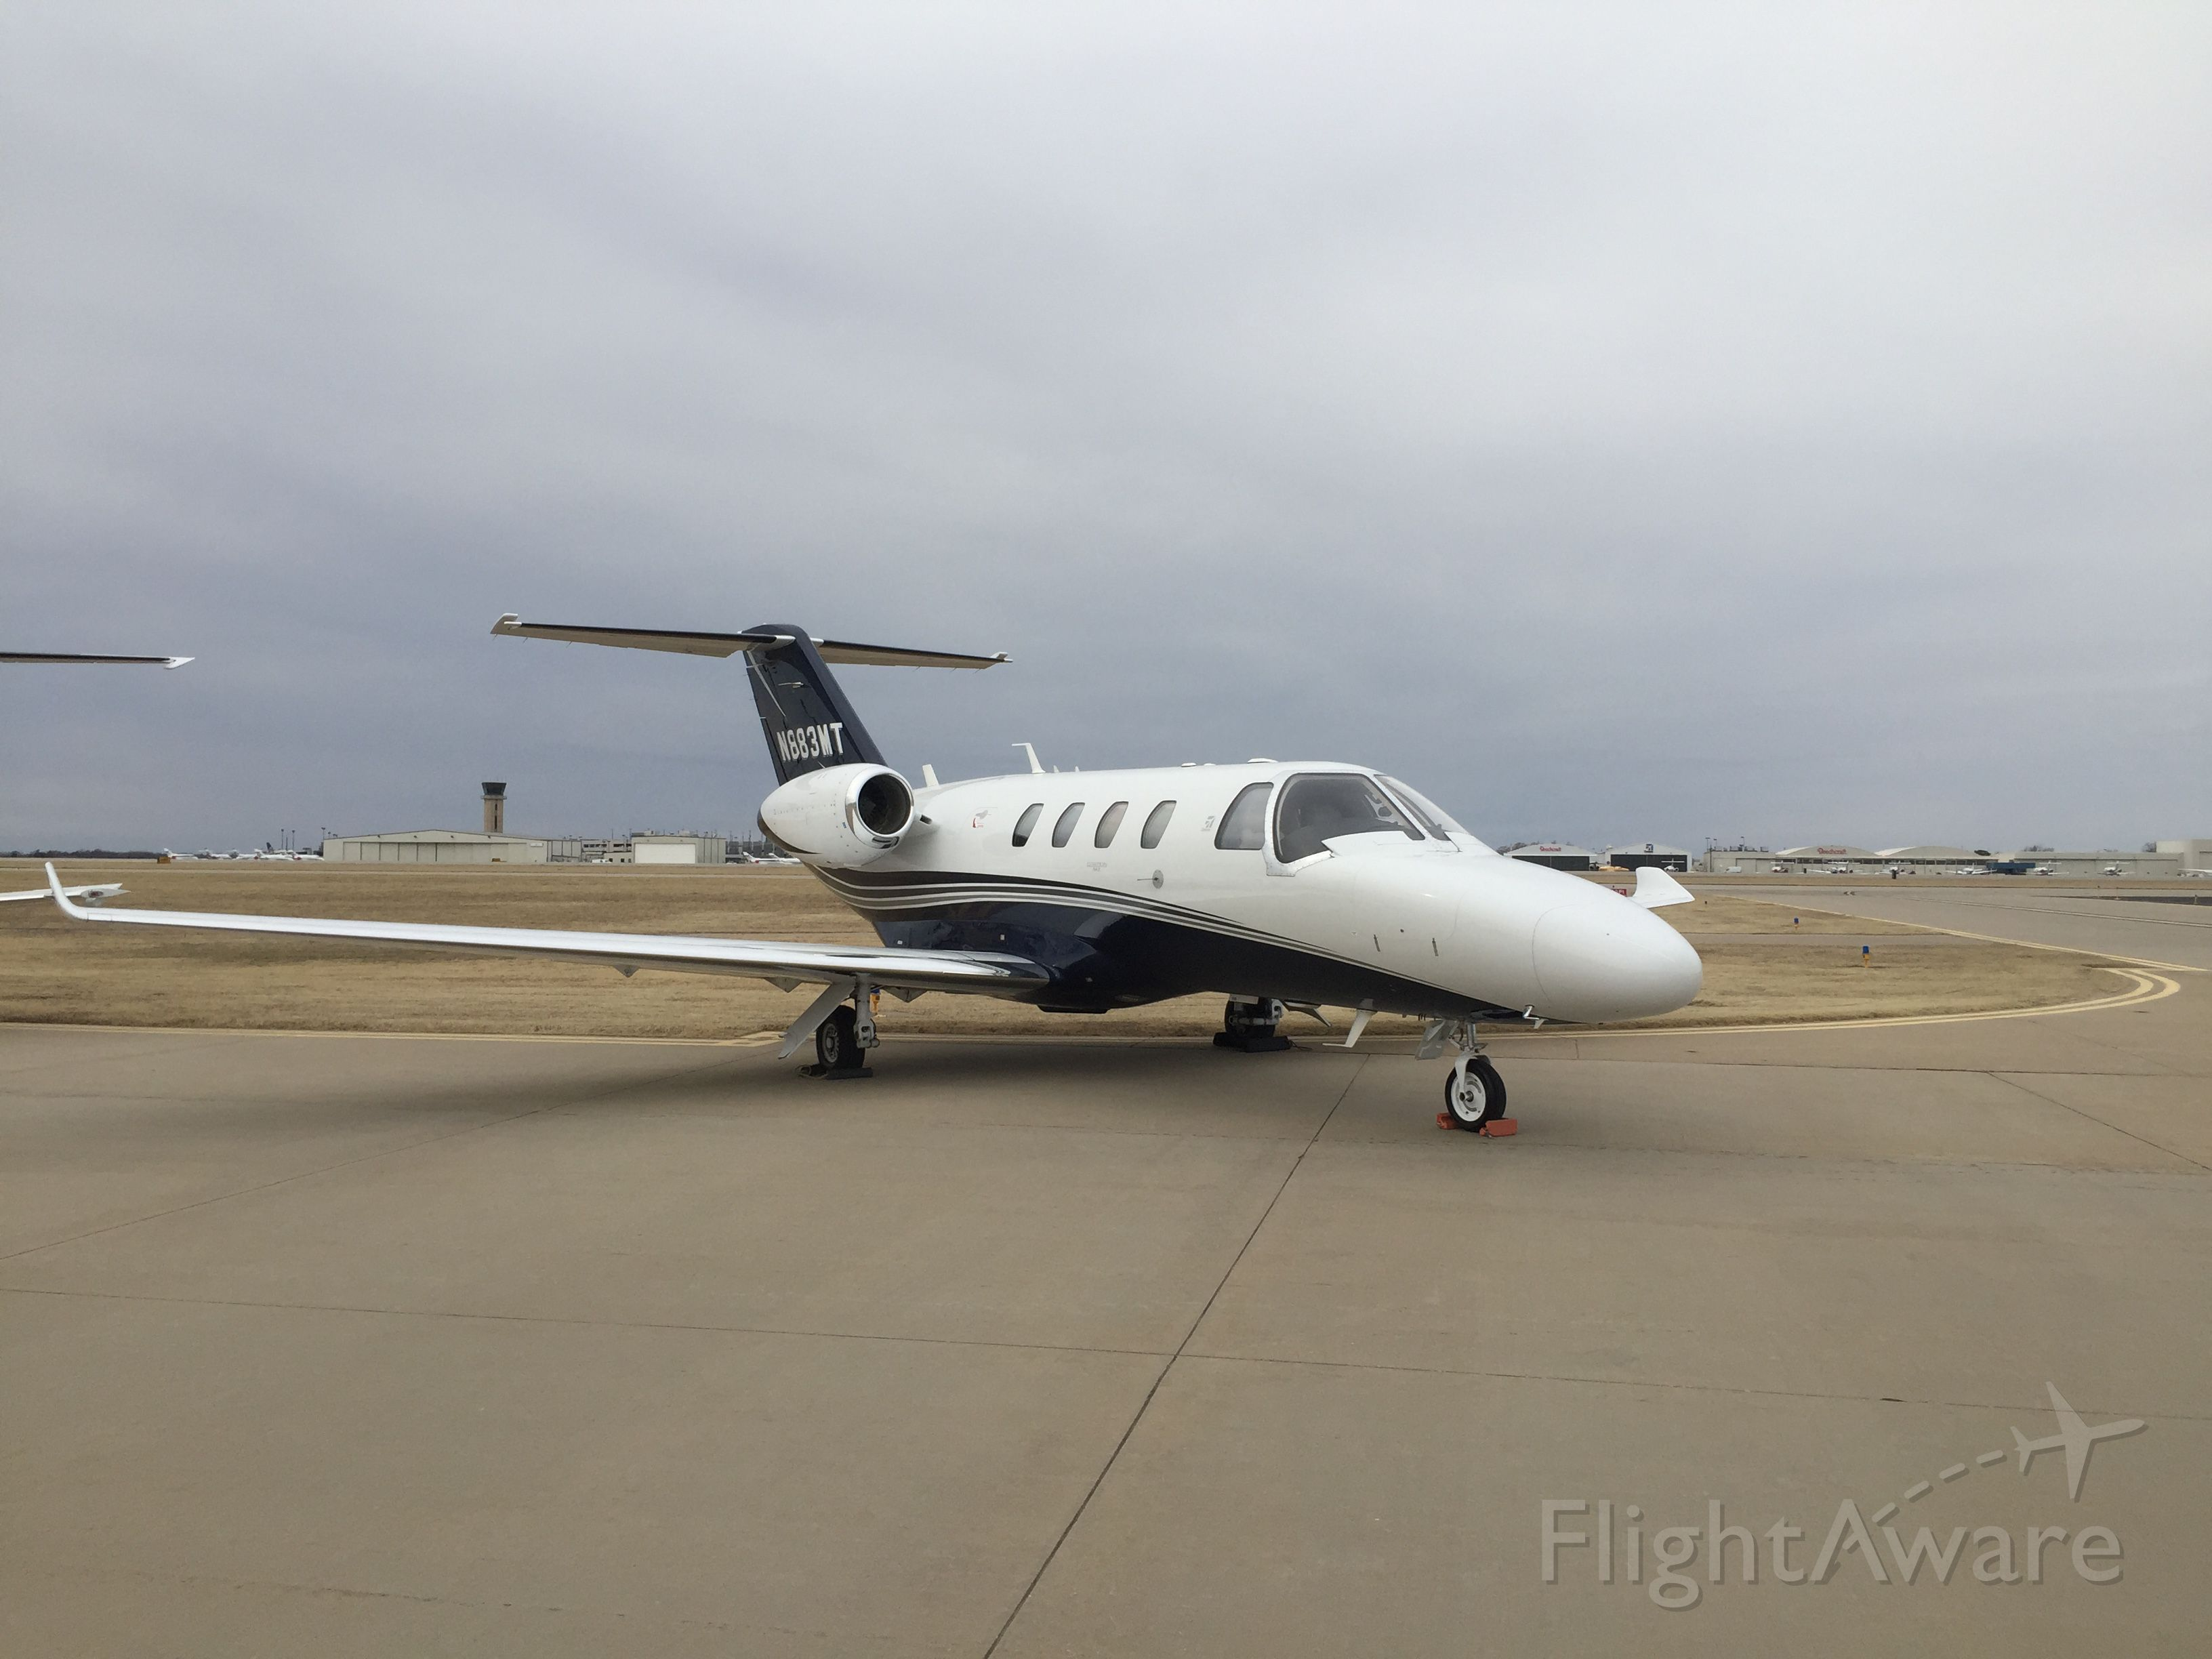 Cessna Citation M2 (N883MT) - At the Cessna Service Center